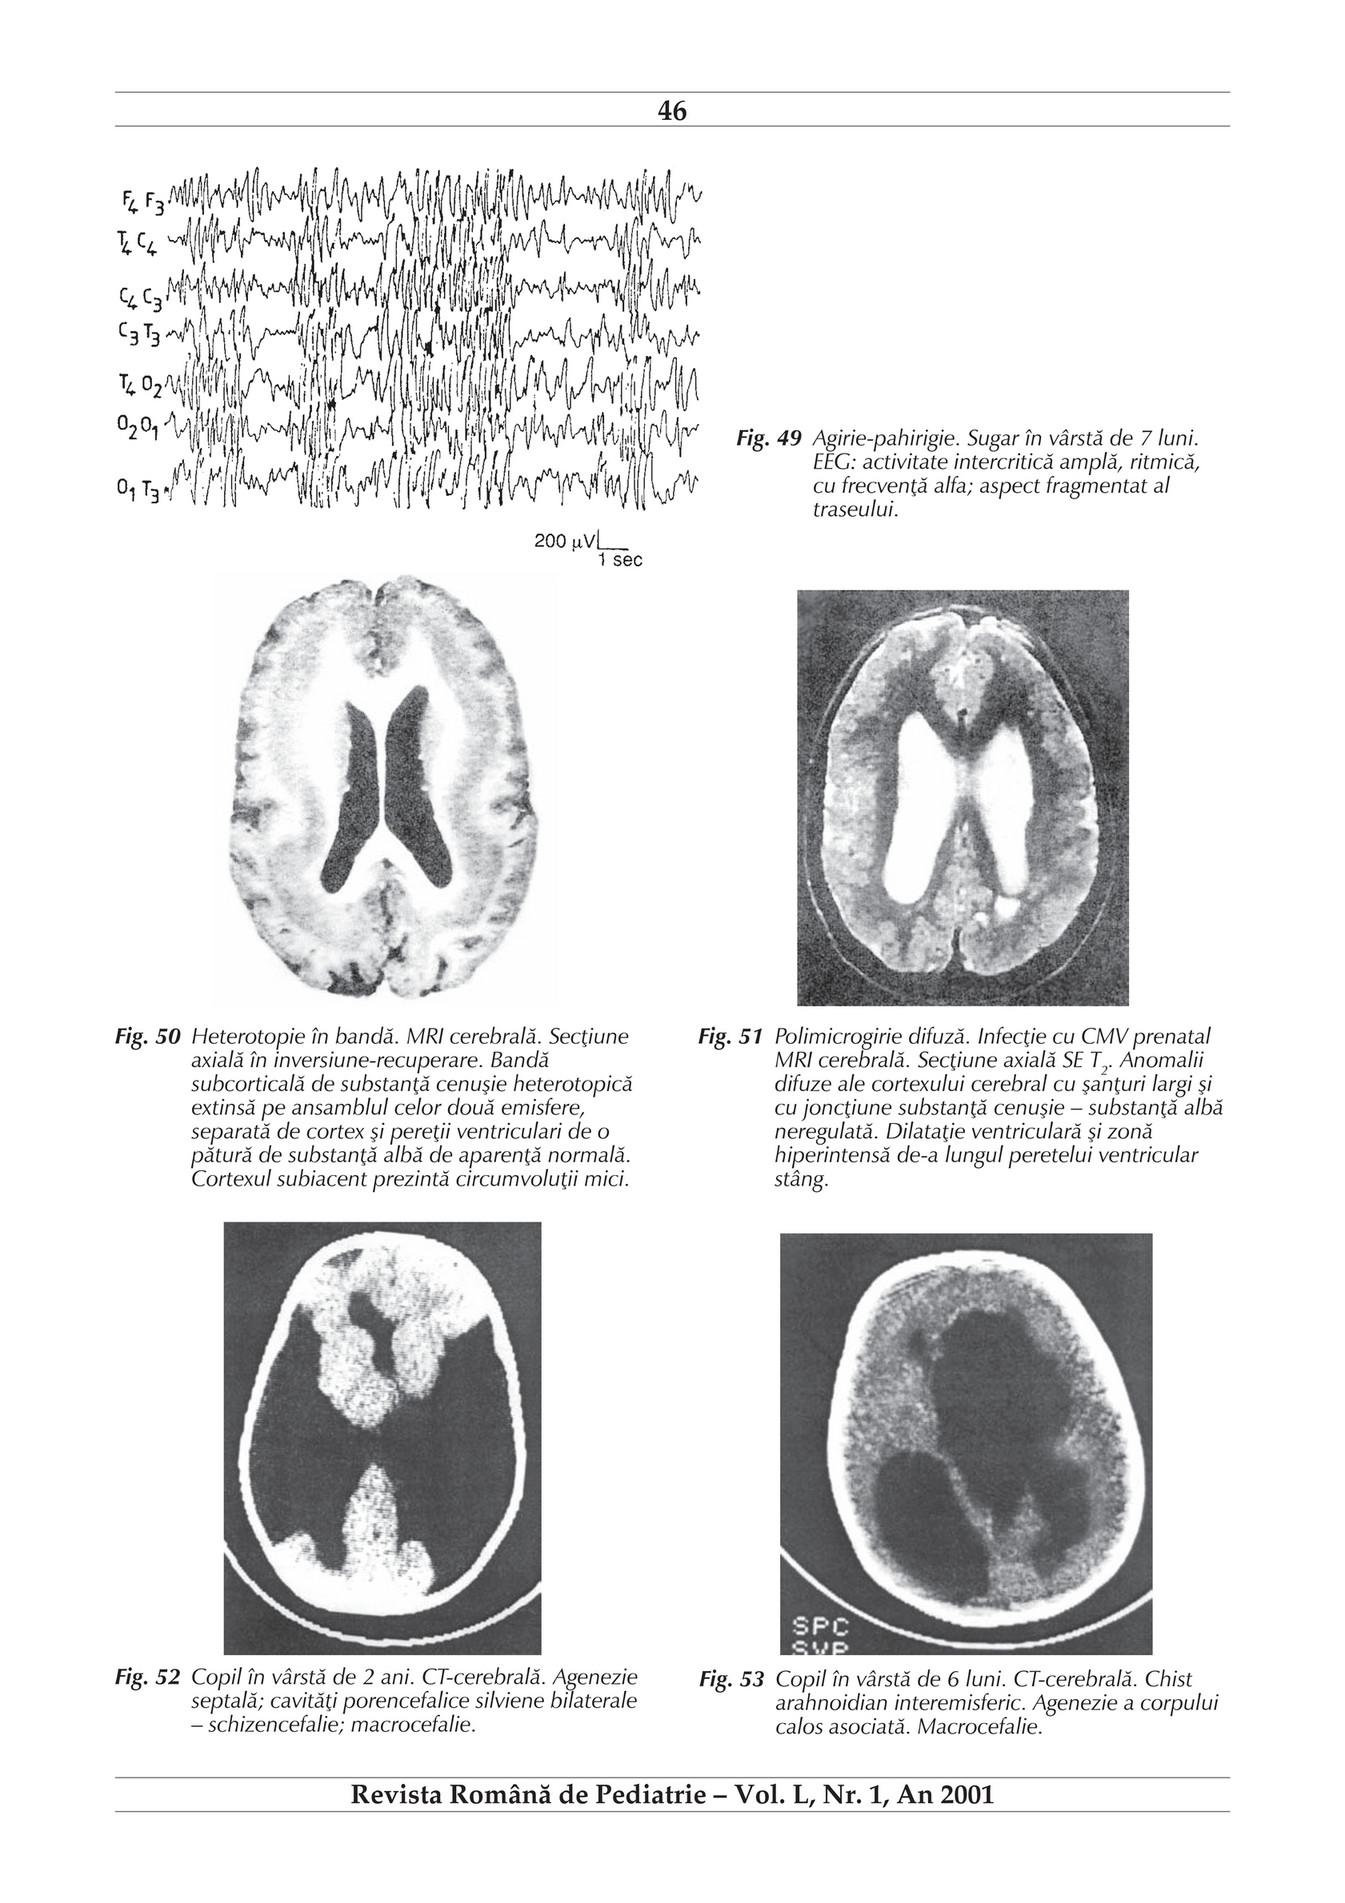 Anatomia, fiziologia si afectiunile corpului uman | veritasvalentin | Pagina 3